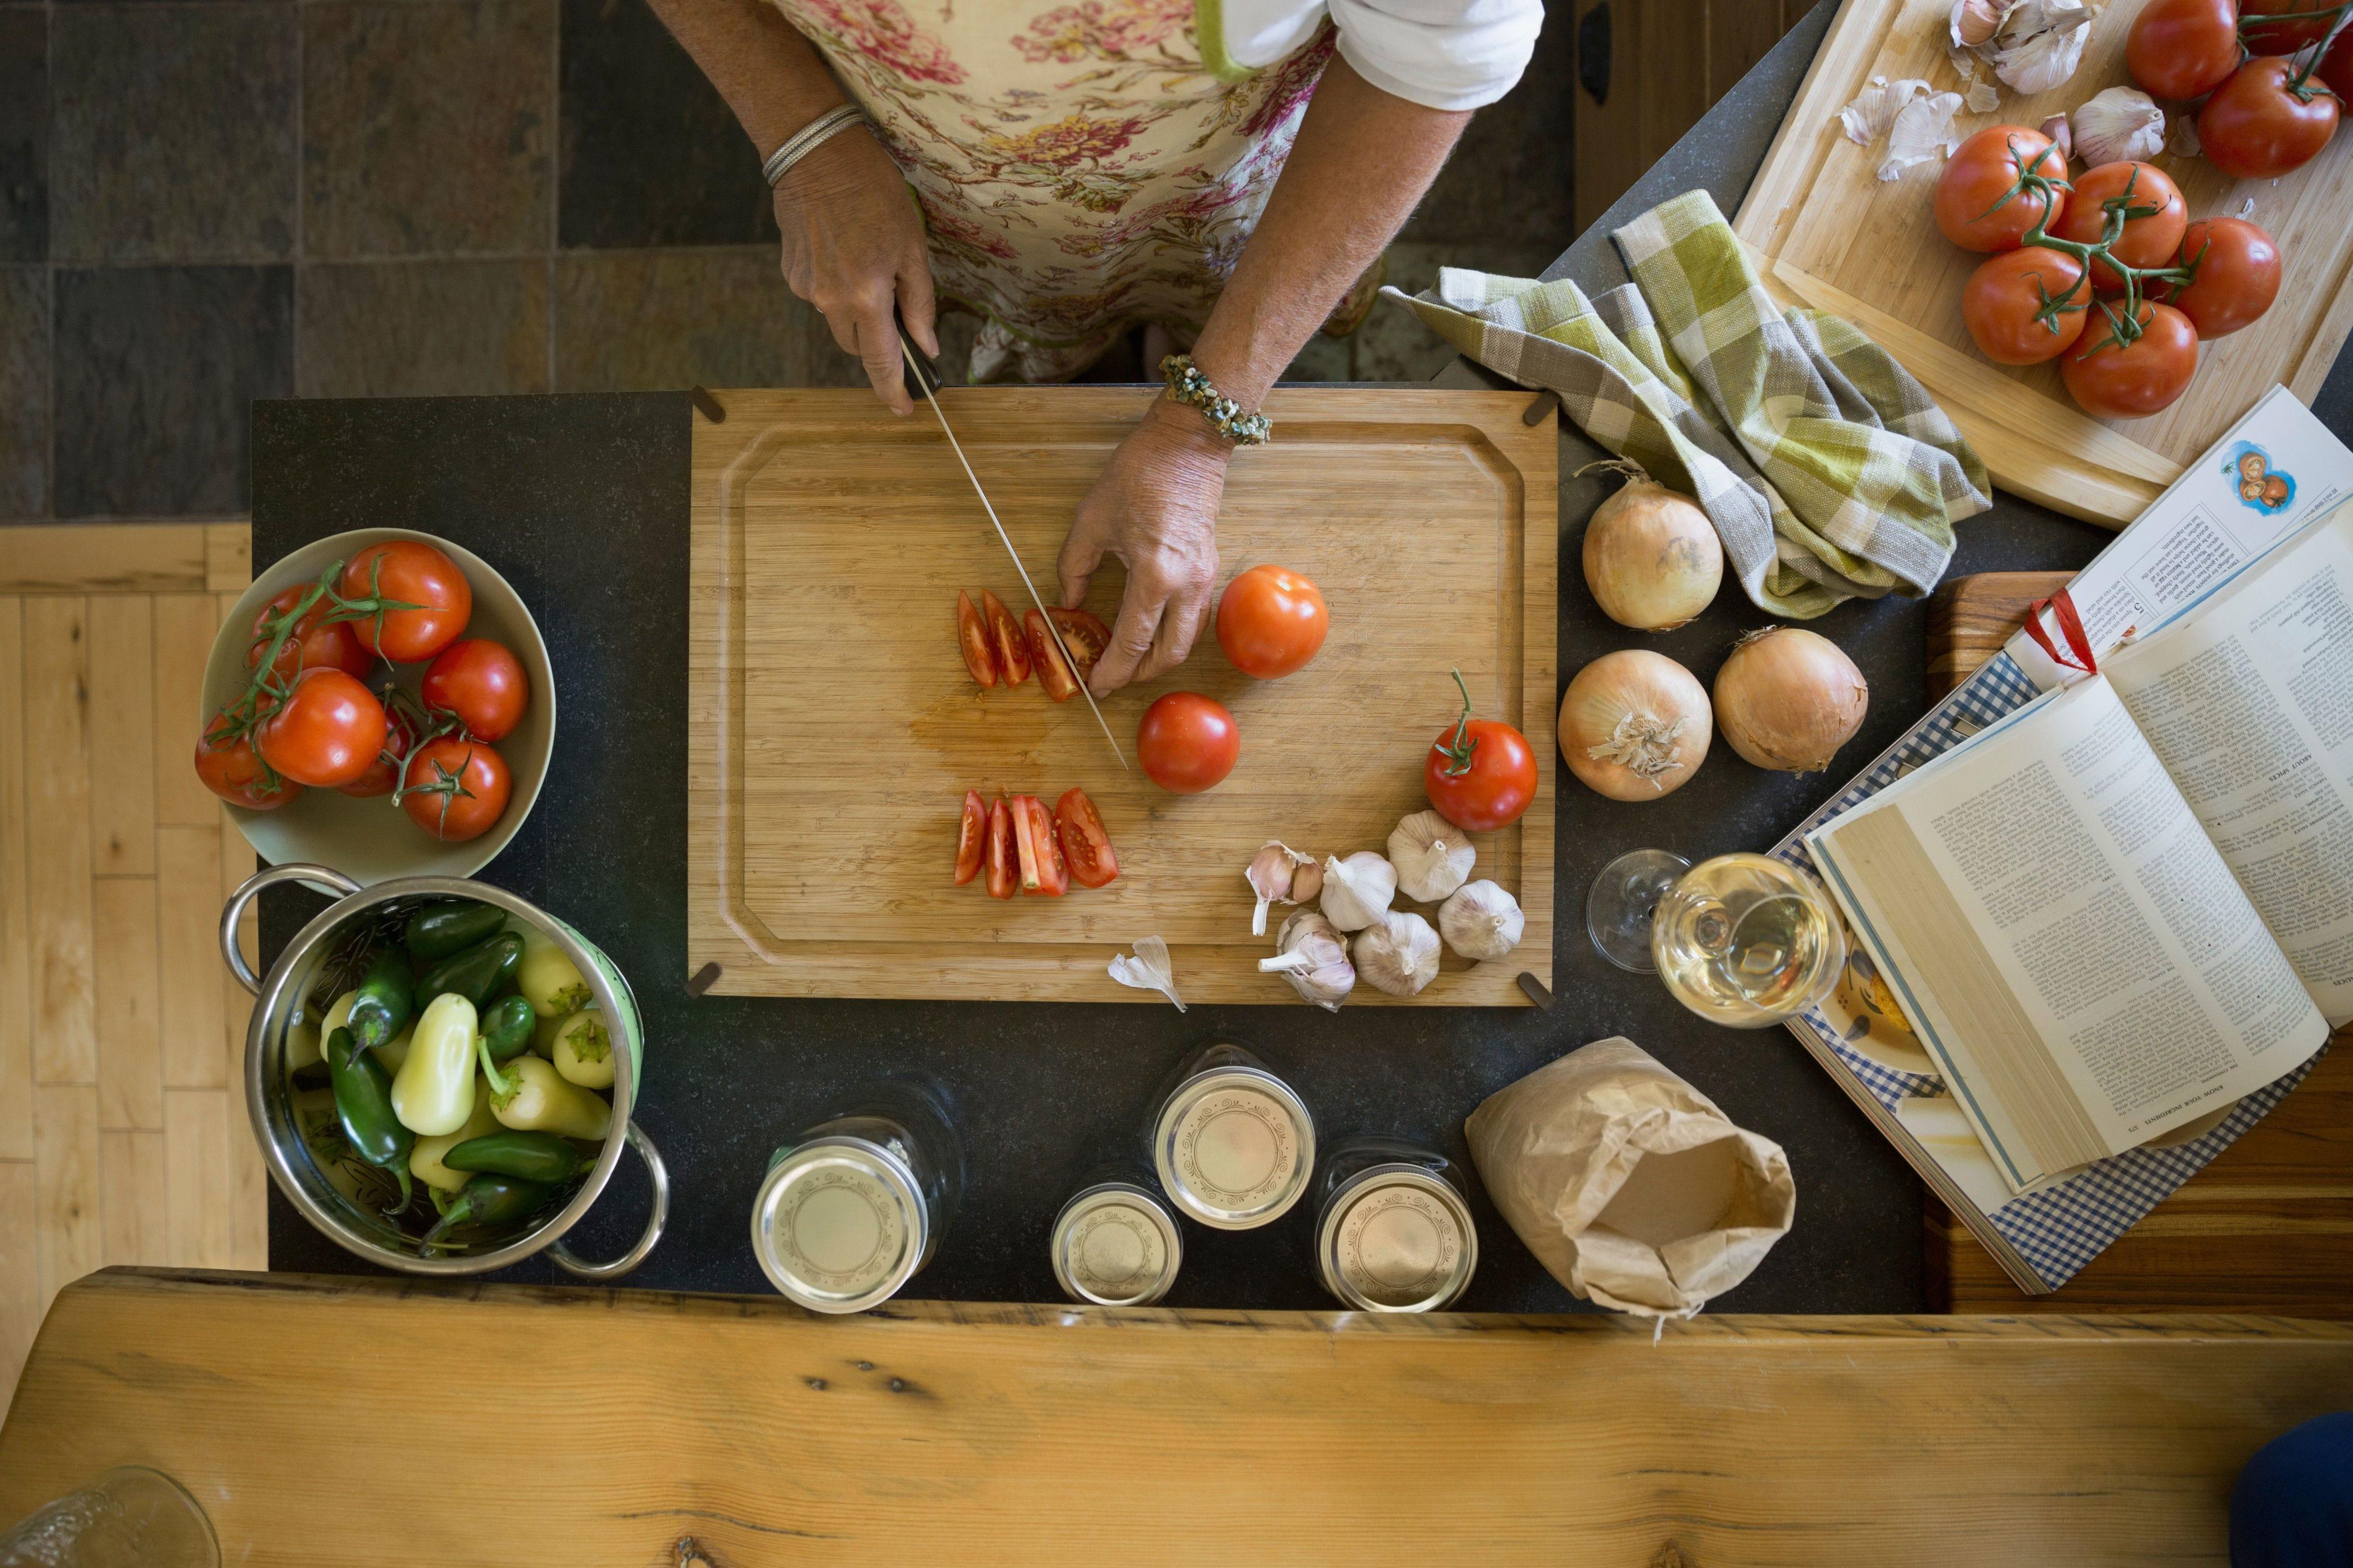 Food, Vegetable, Cuisine, Tomato, Ingredient, Dish, Vegetarian food, Recipe, Fruit, Produce,